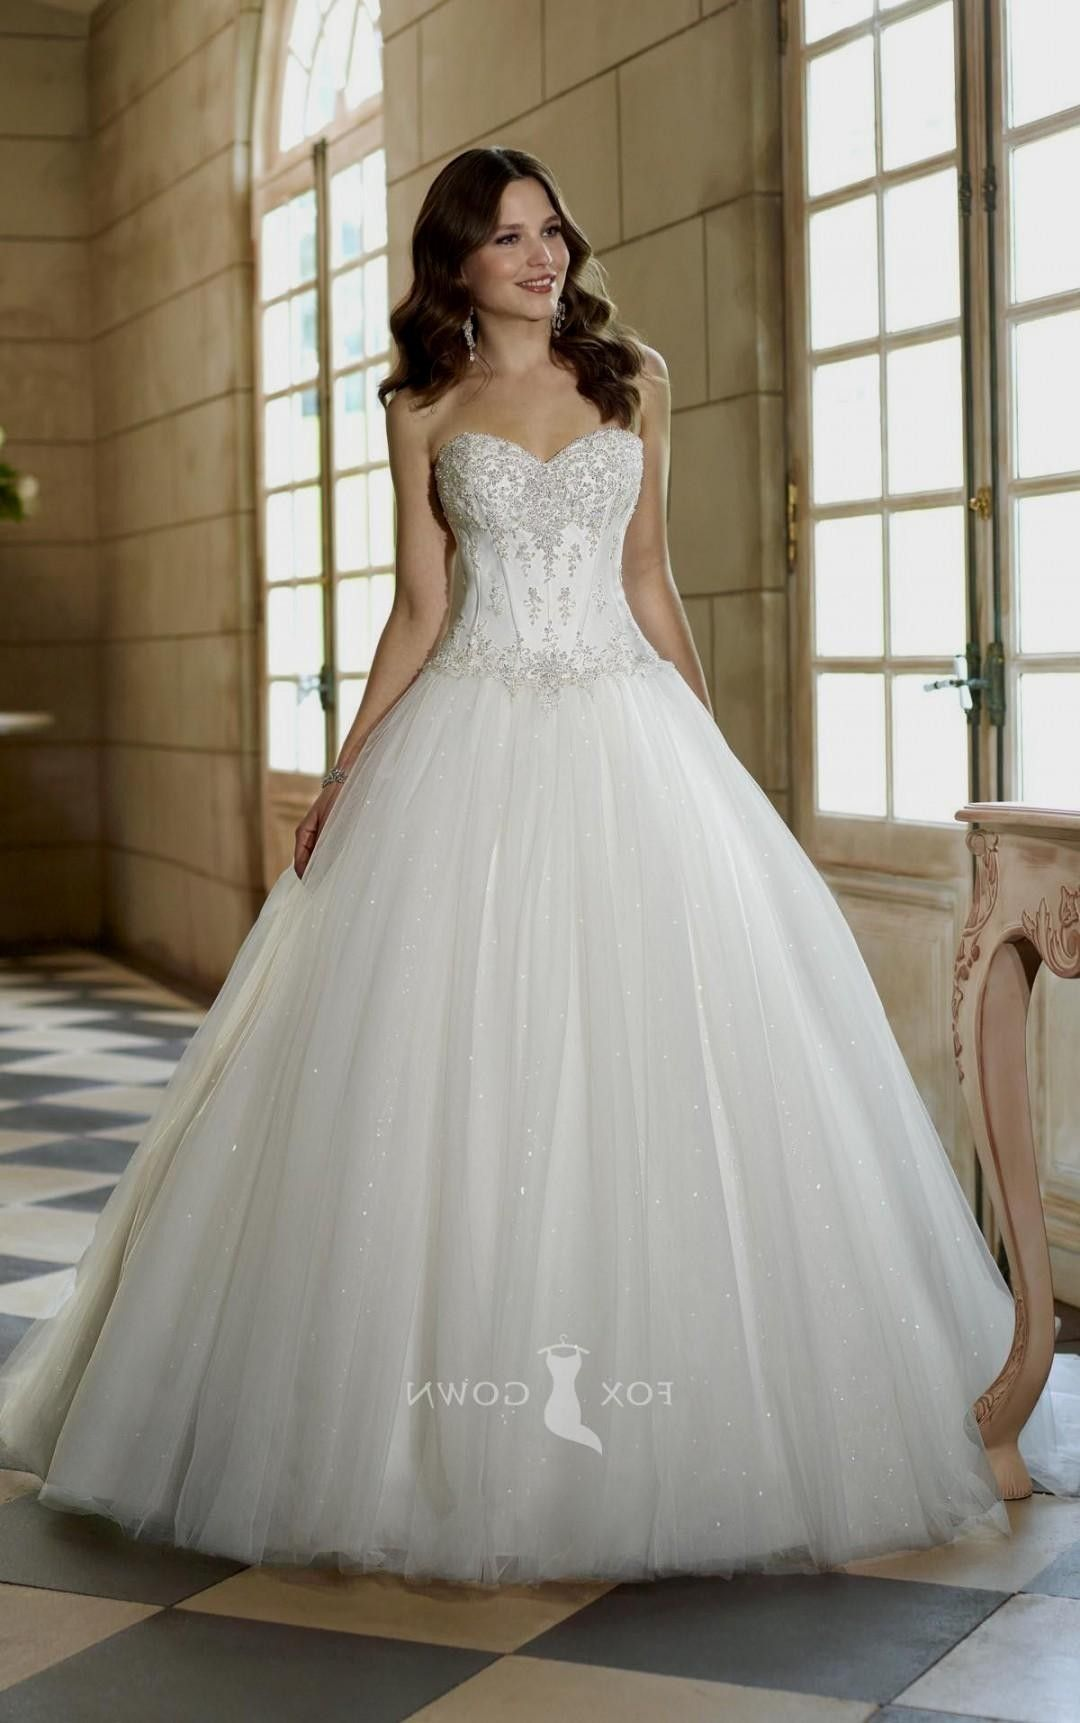 Wedding Dresses Sweetheart Neckline Ball Gown Bling Google Search Wedding Dresses Tulle Wedding Dress Wedding Dresses Strapless [ 1723 x 1080 Pixel ]